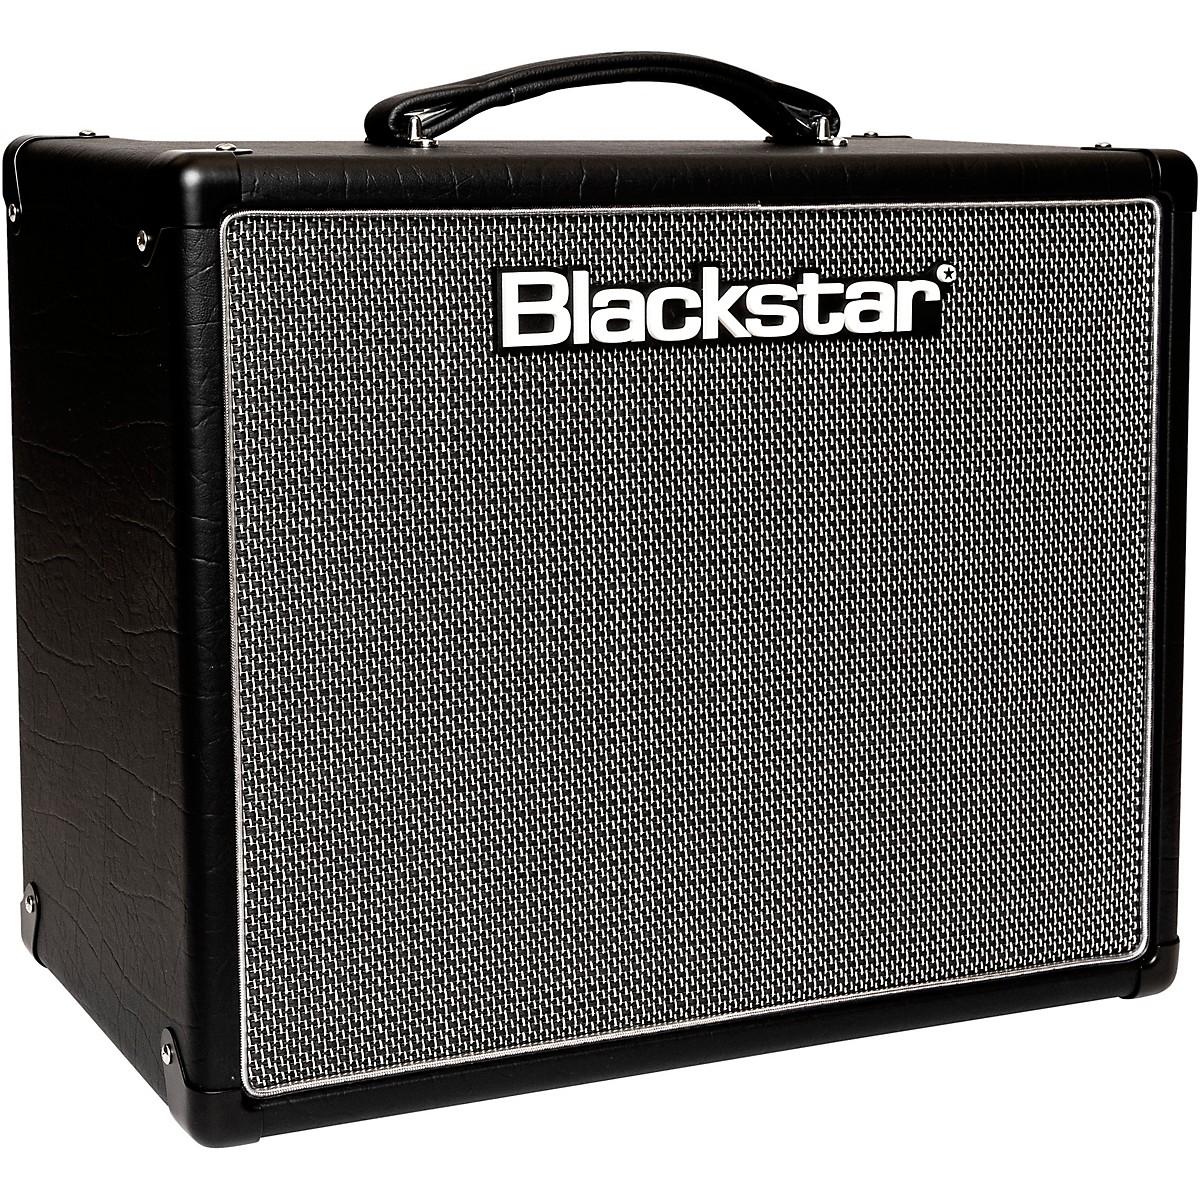 Blackstar HT-5RH MkII 5W 1x12 Tube Guitar Combo Amp